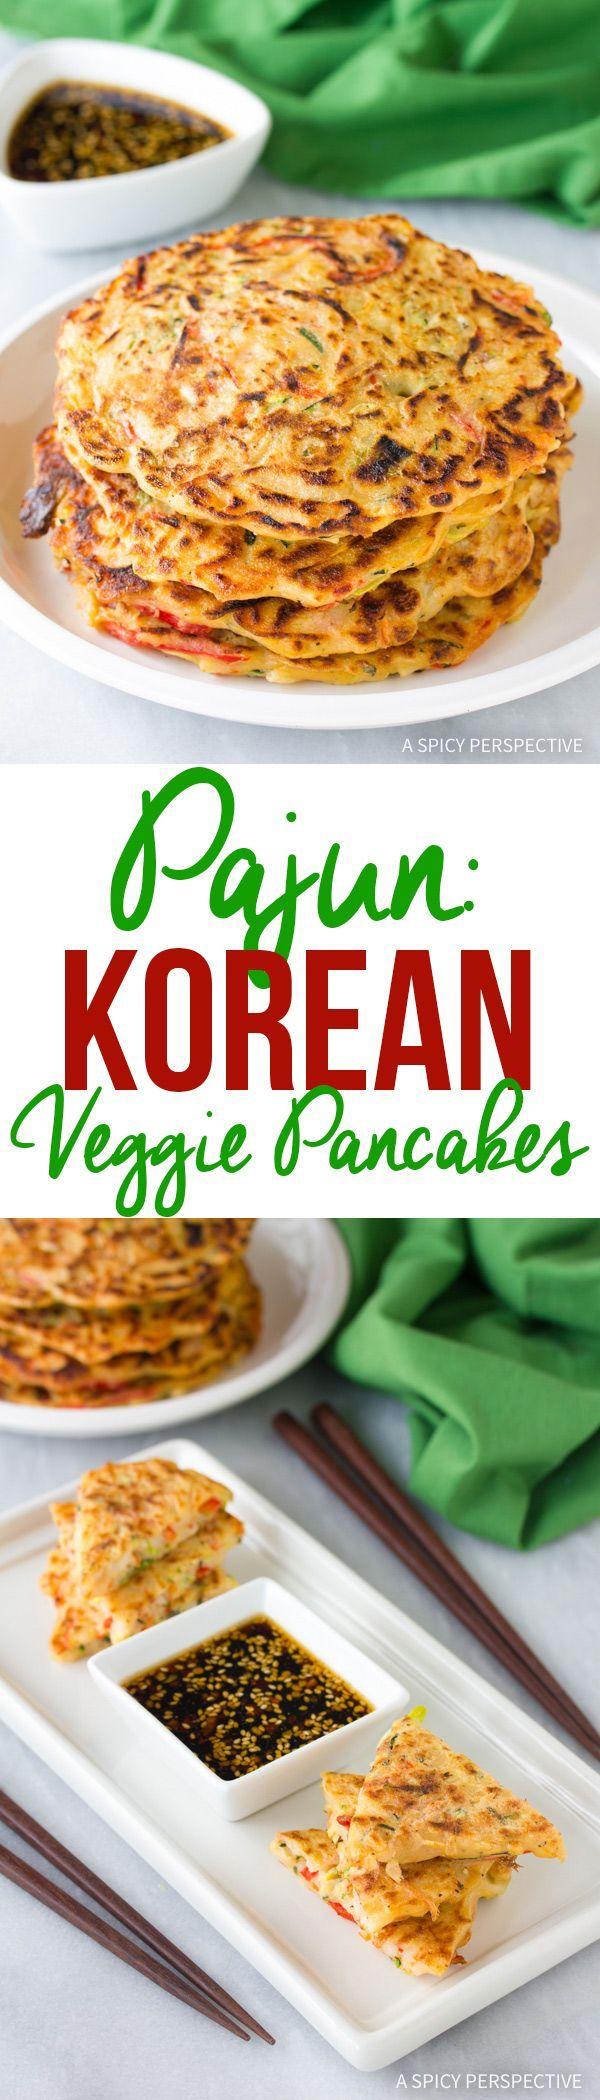 335 best korean images on pinterest cooking food korean food korean pancakes pajun pajeon party food recipeskorean forumfinder Gallery